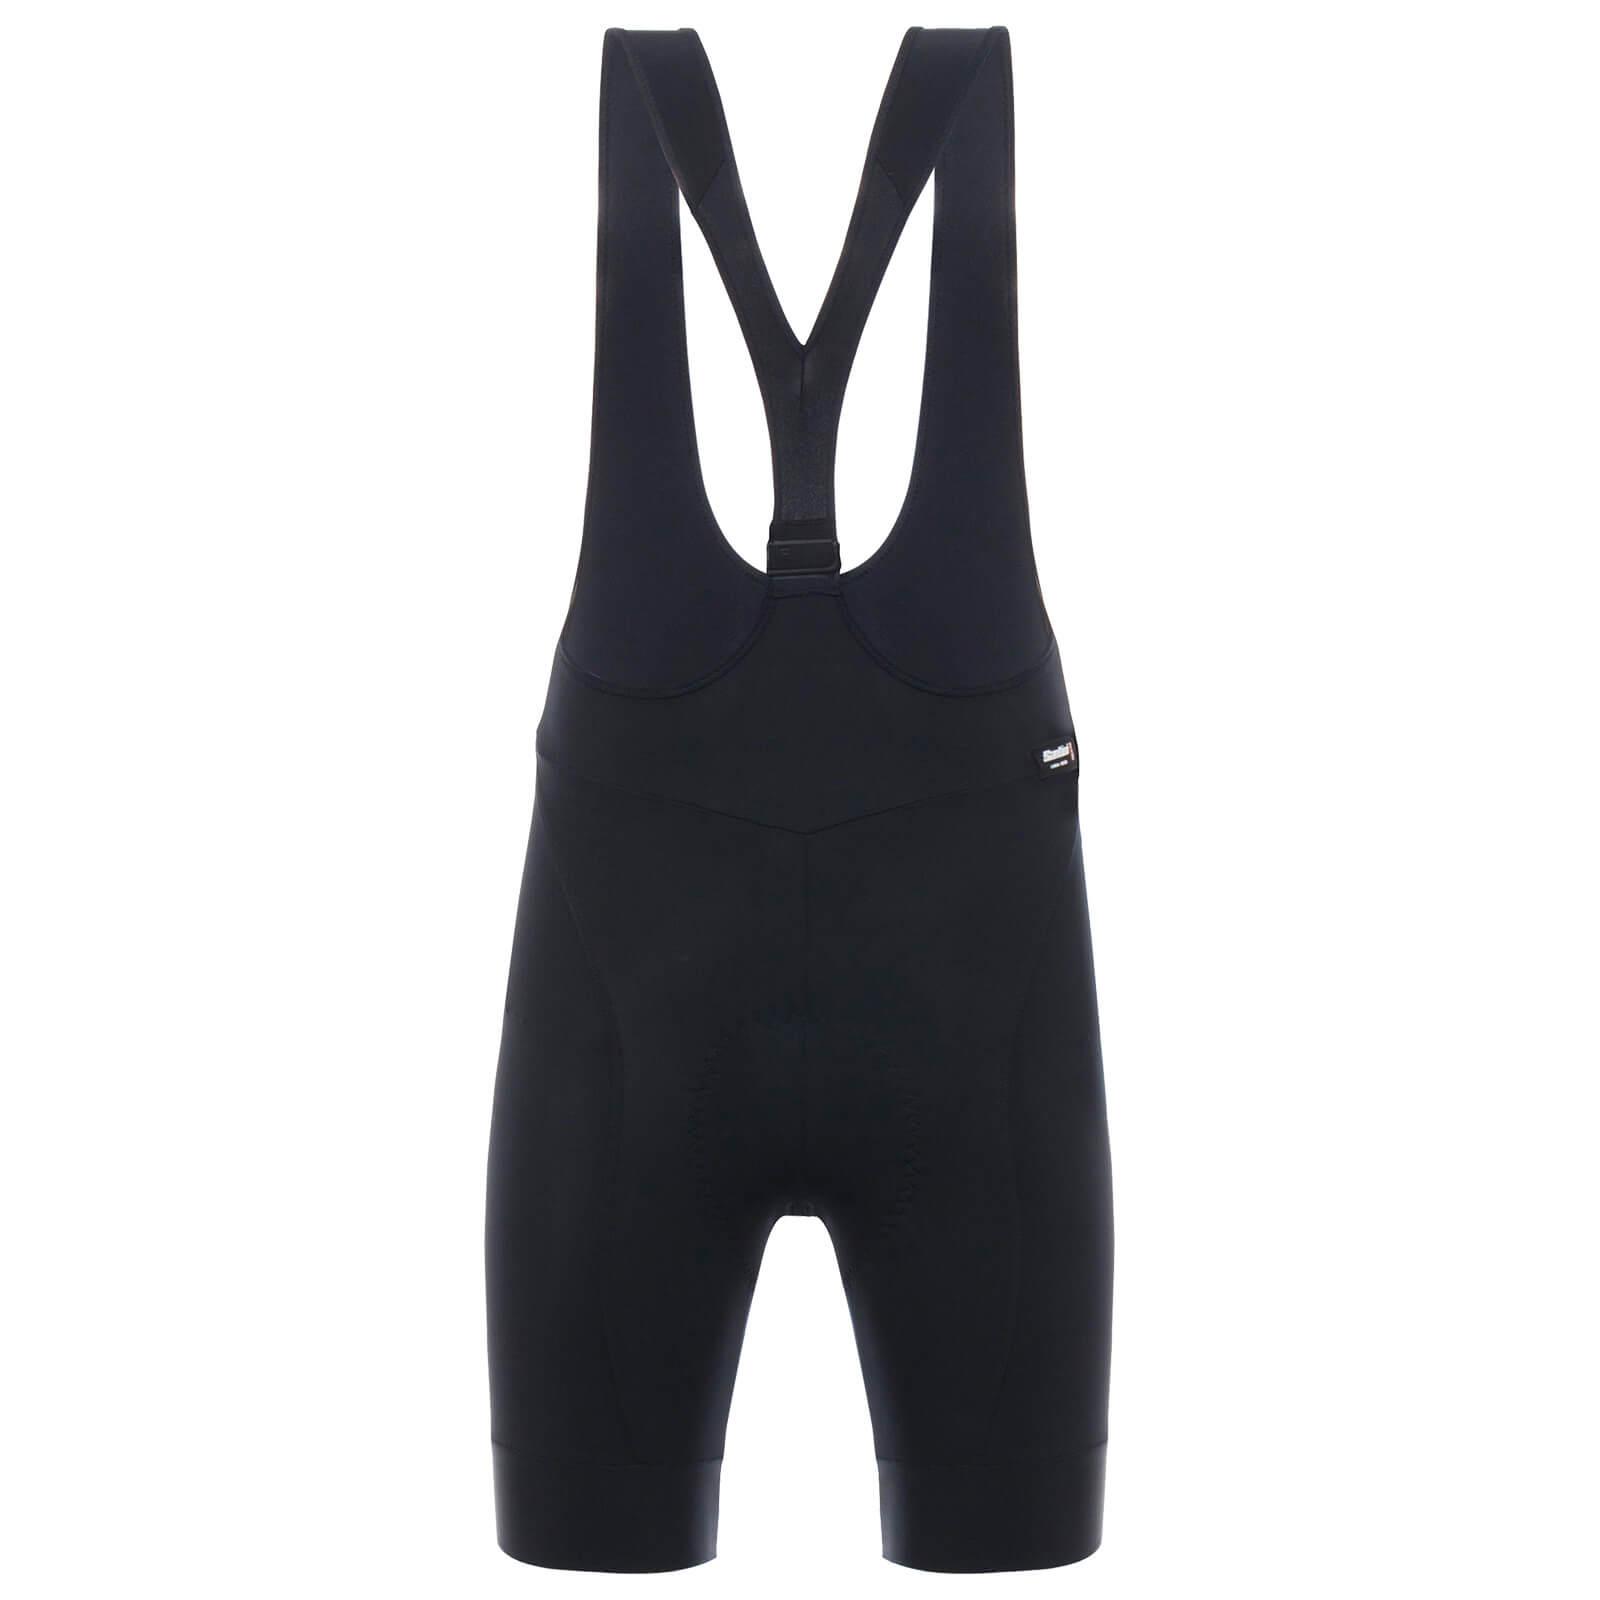 Santini Women's Legend Bib Shorts - L - Black